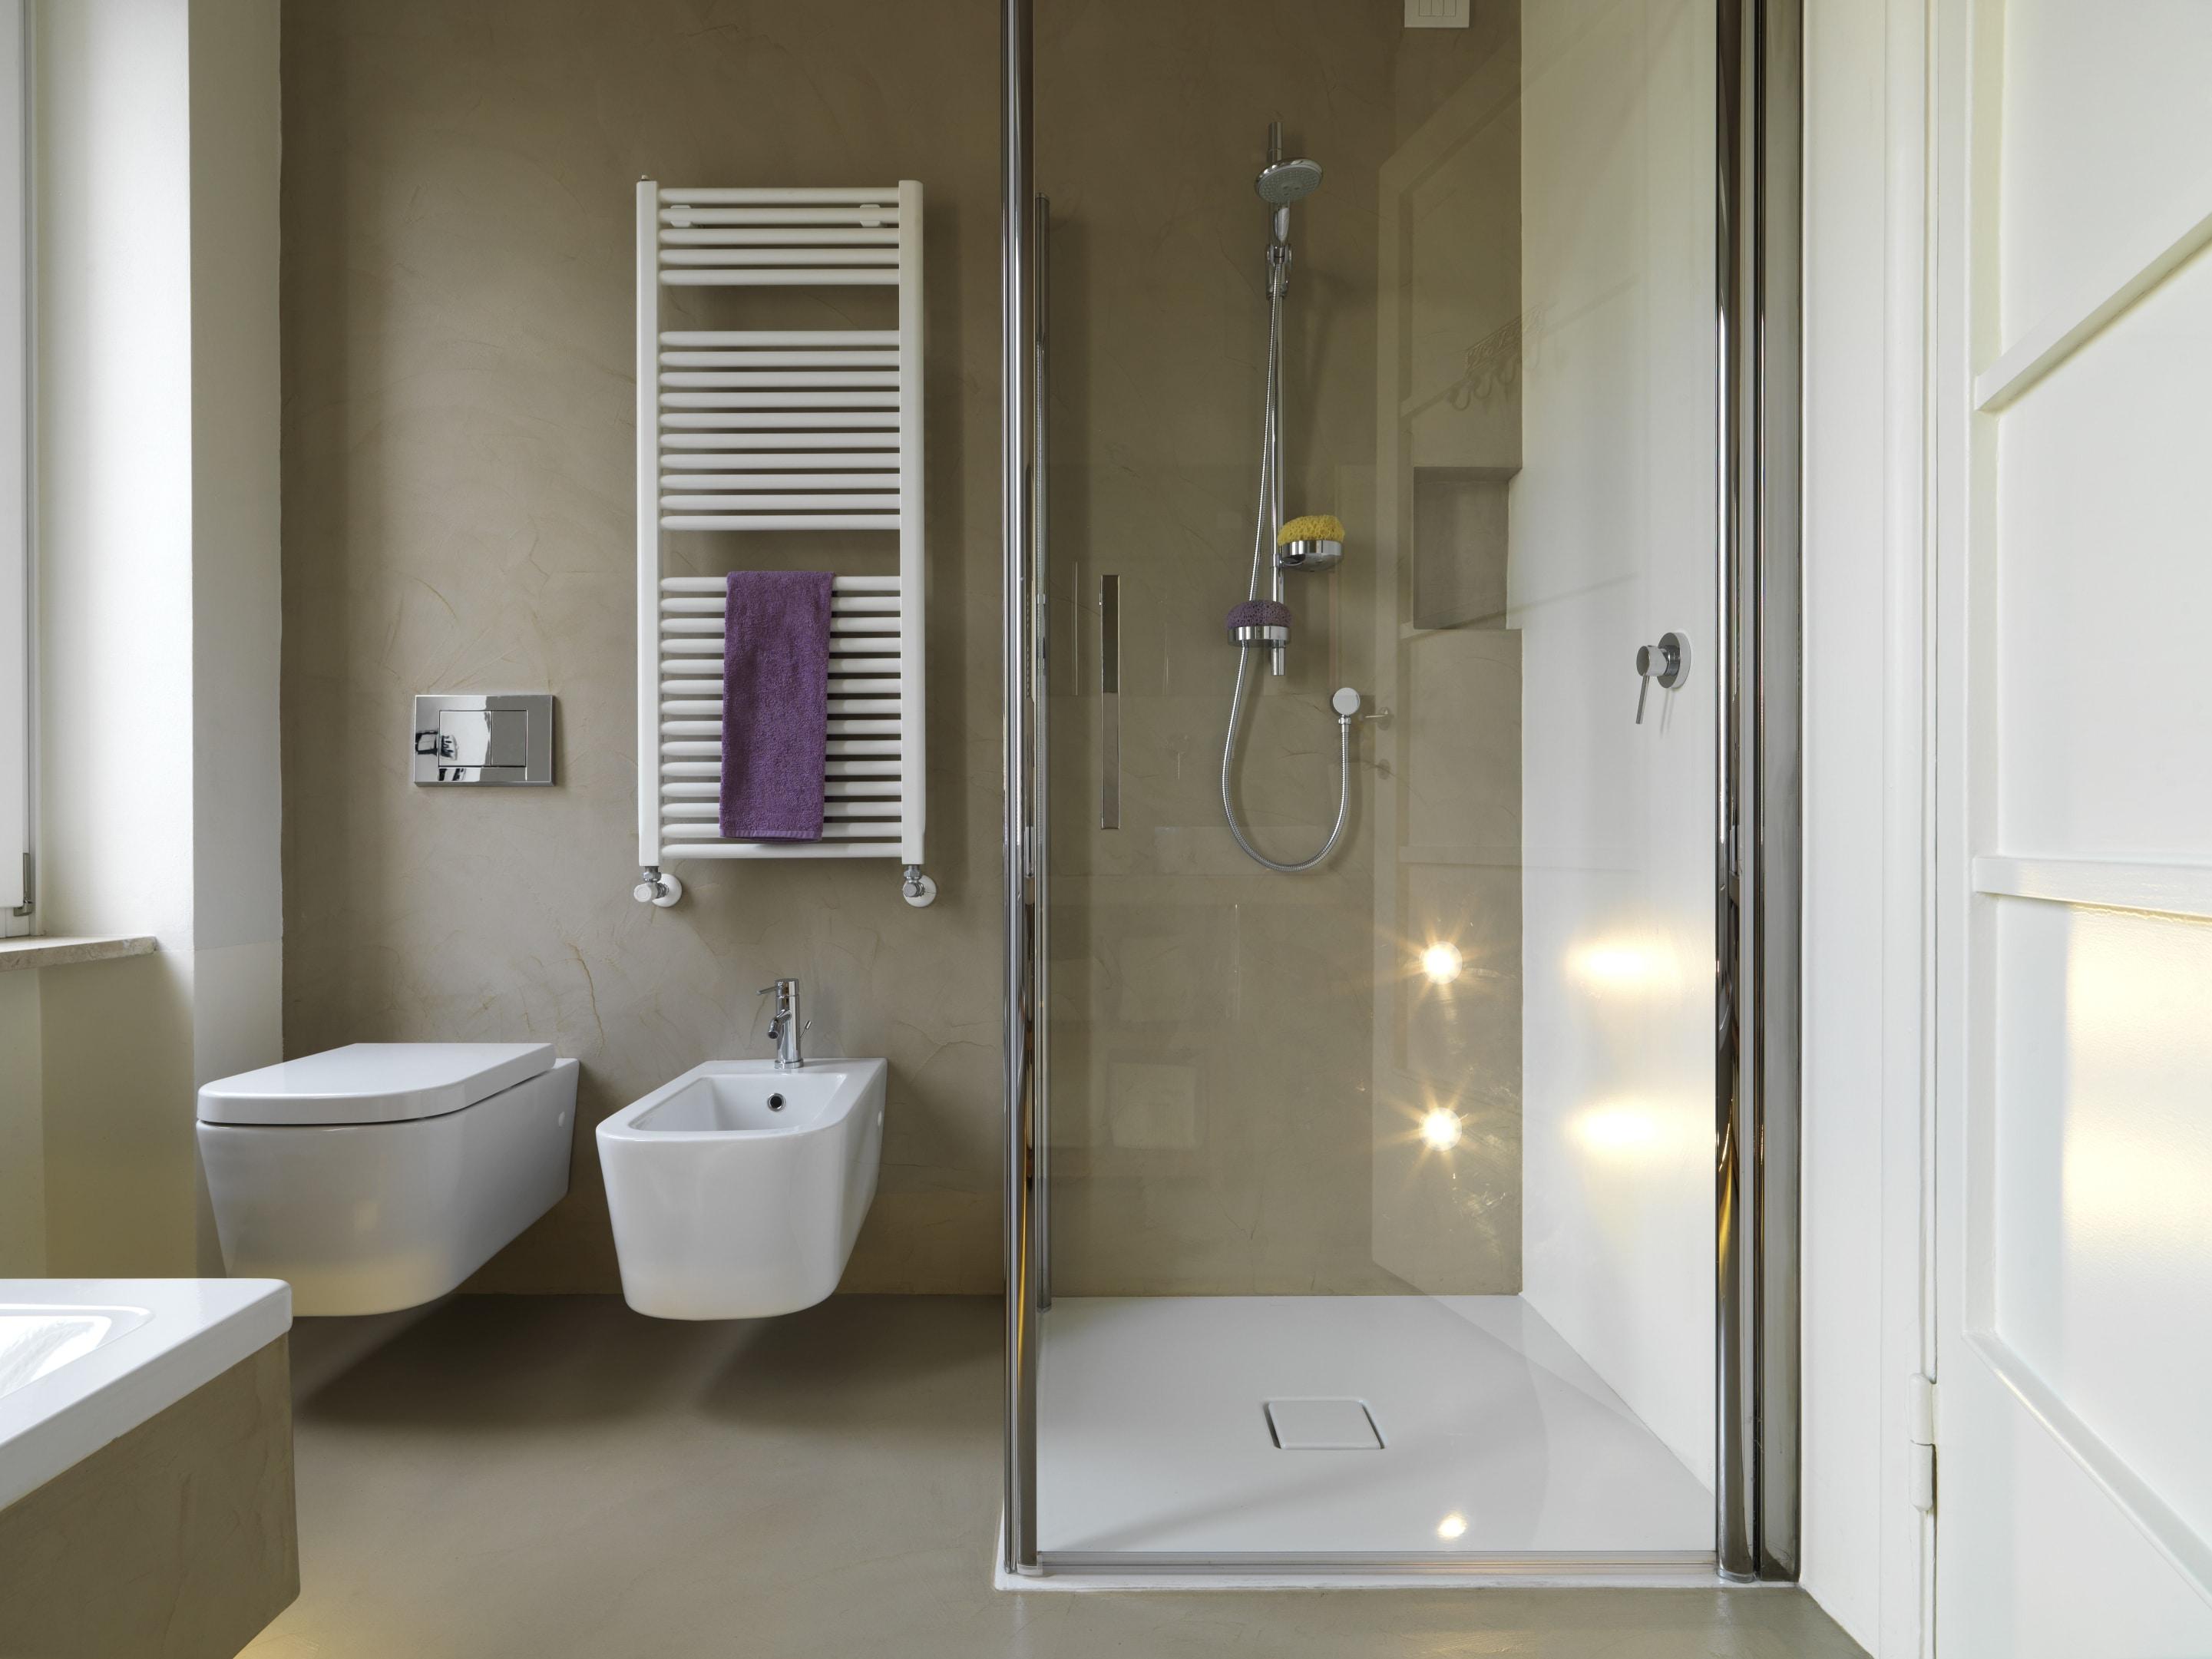 Choisir un radiateur de salle de bain